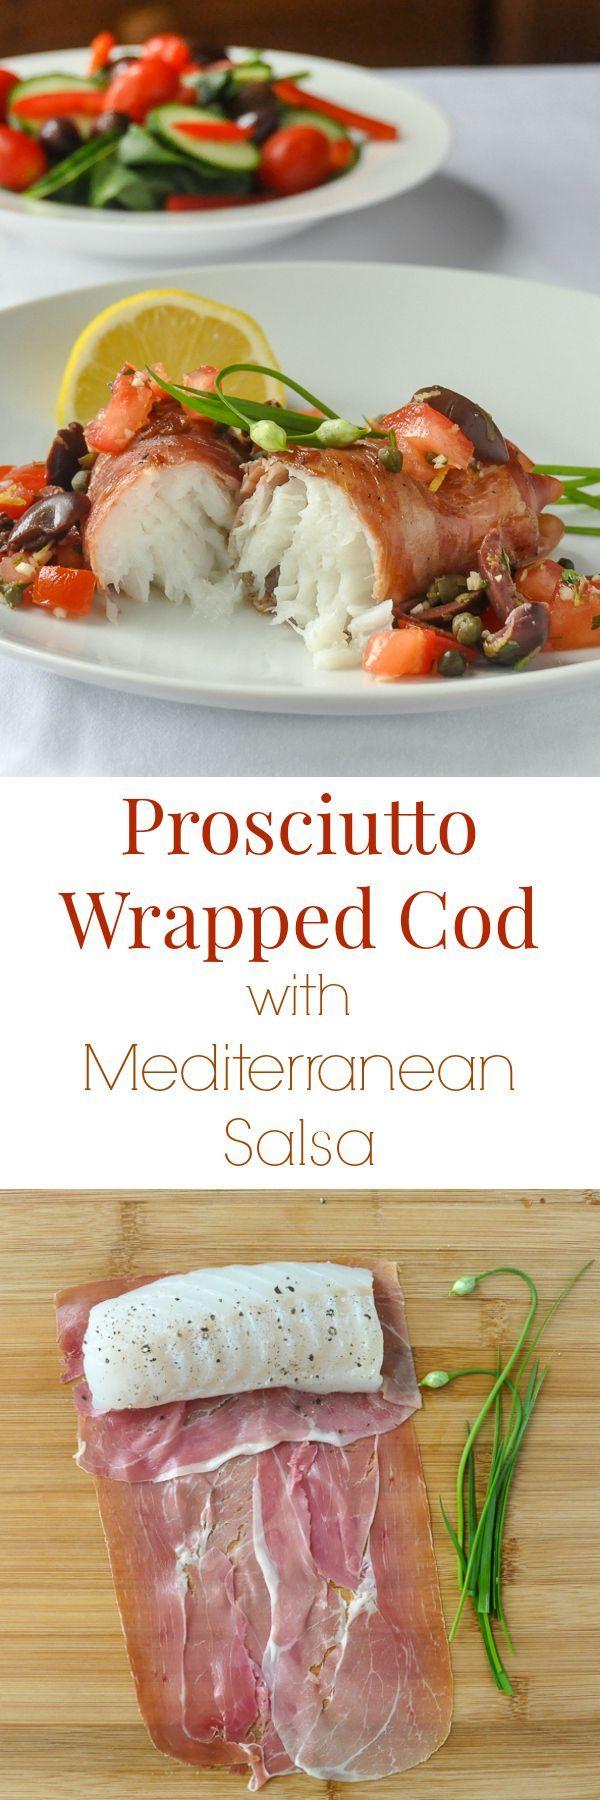 Prosciutto Wrapped Cod with Mediterranean Salsa - beautiful fresh north Atlantic cod wrapped in prosciutto and served with a Mediterranean inspired salsa. #ad